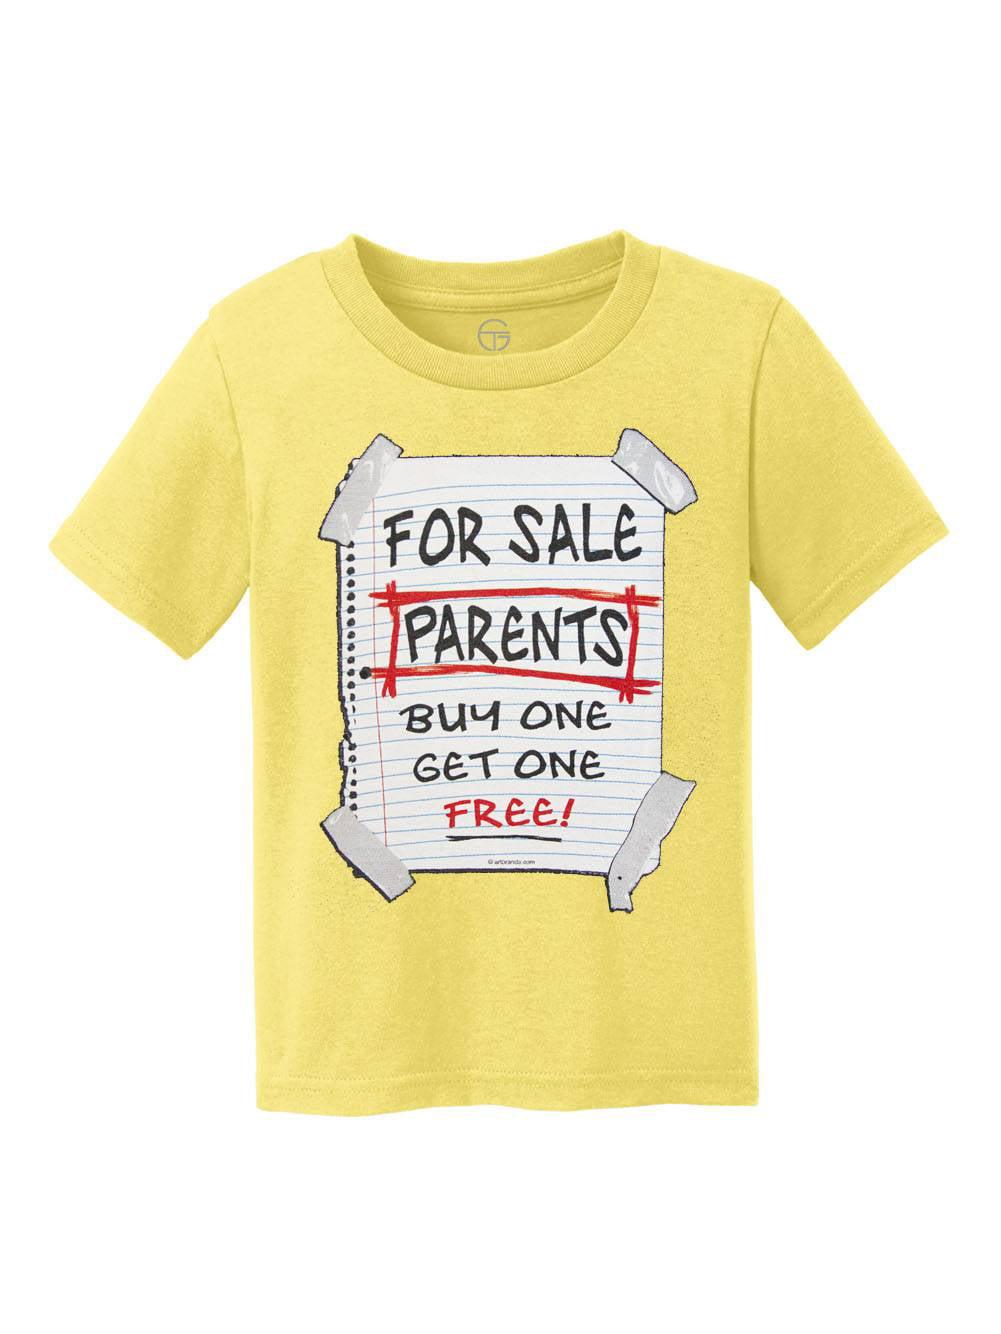 Parents For Sale Youth Cotton T-Shirt